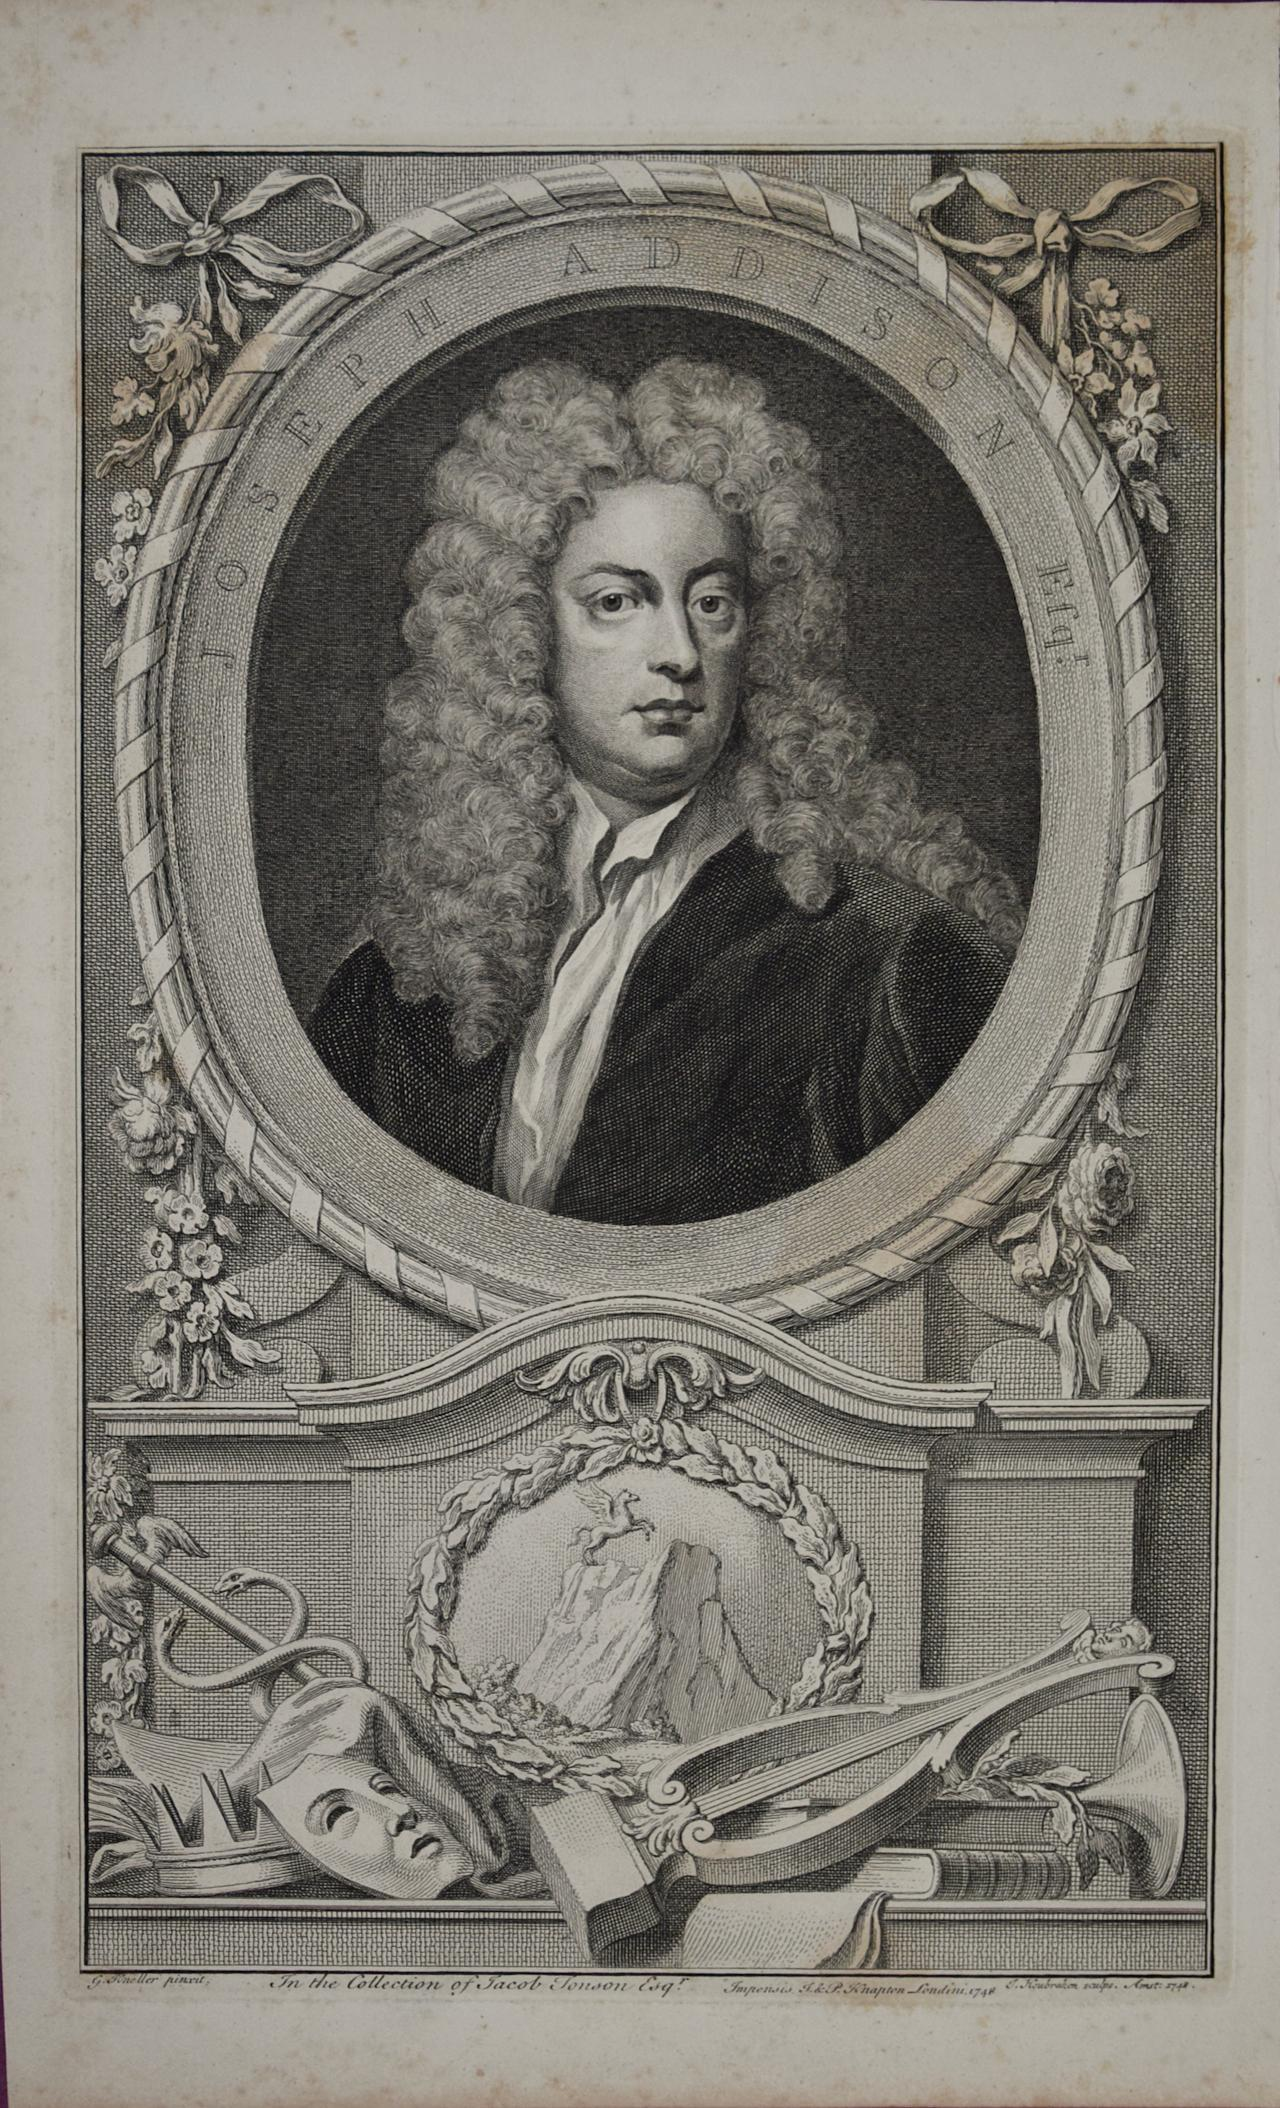 18th C. Portrait of Joseph Addison, Philosopher, Poet, Playwright and Politician